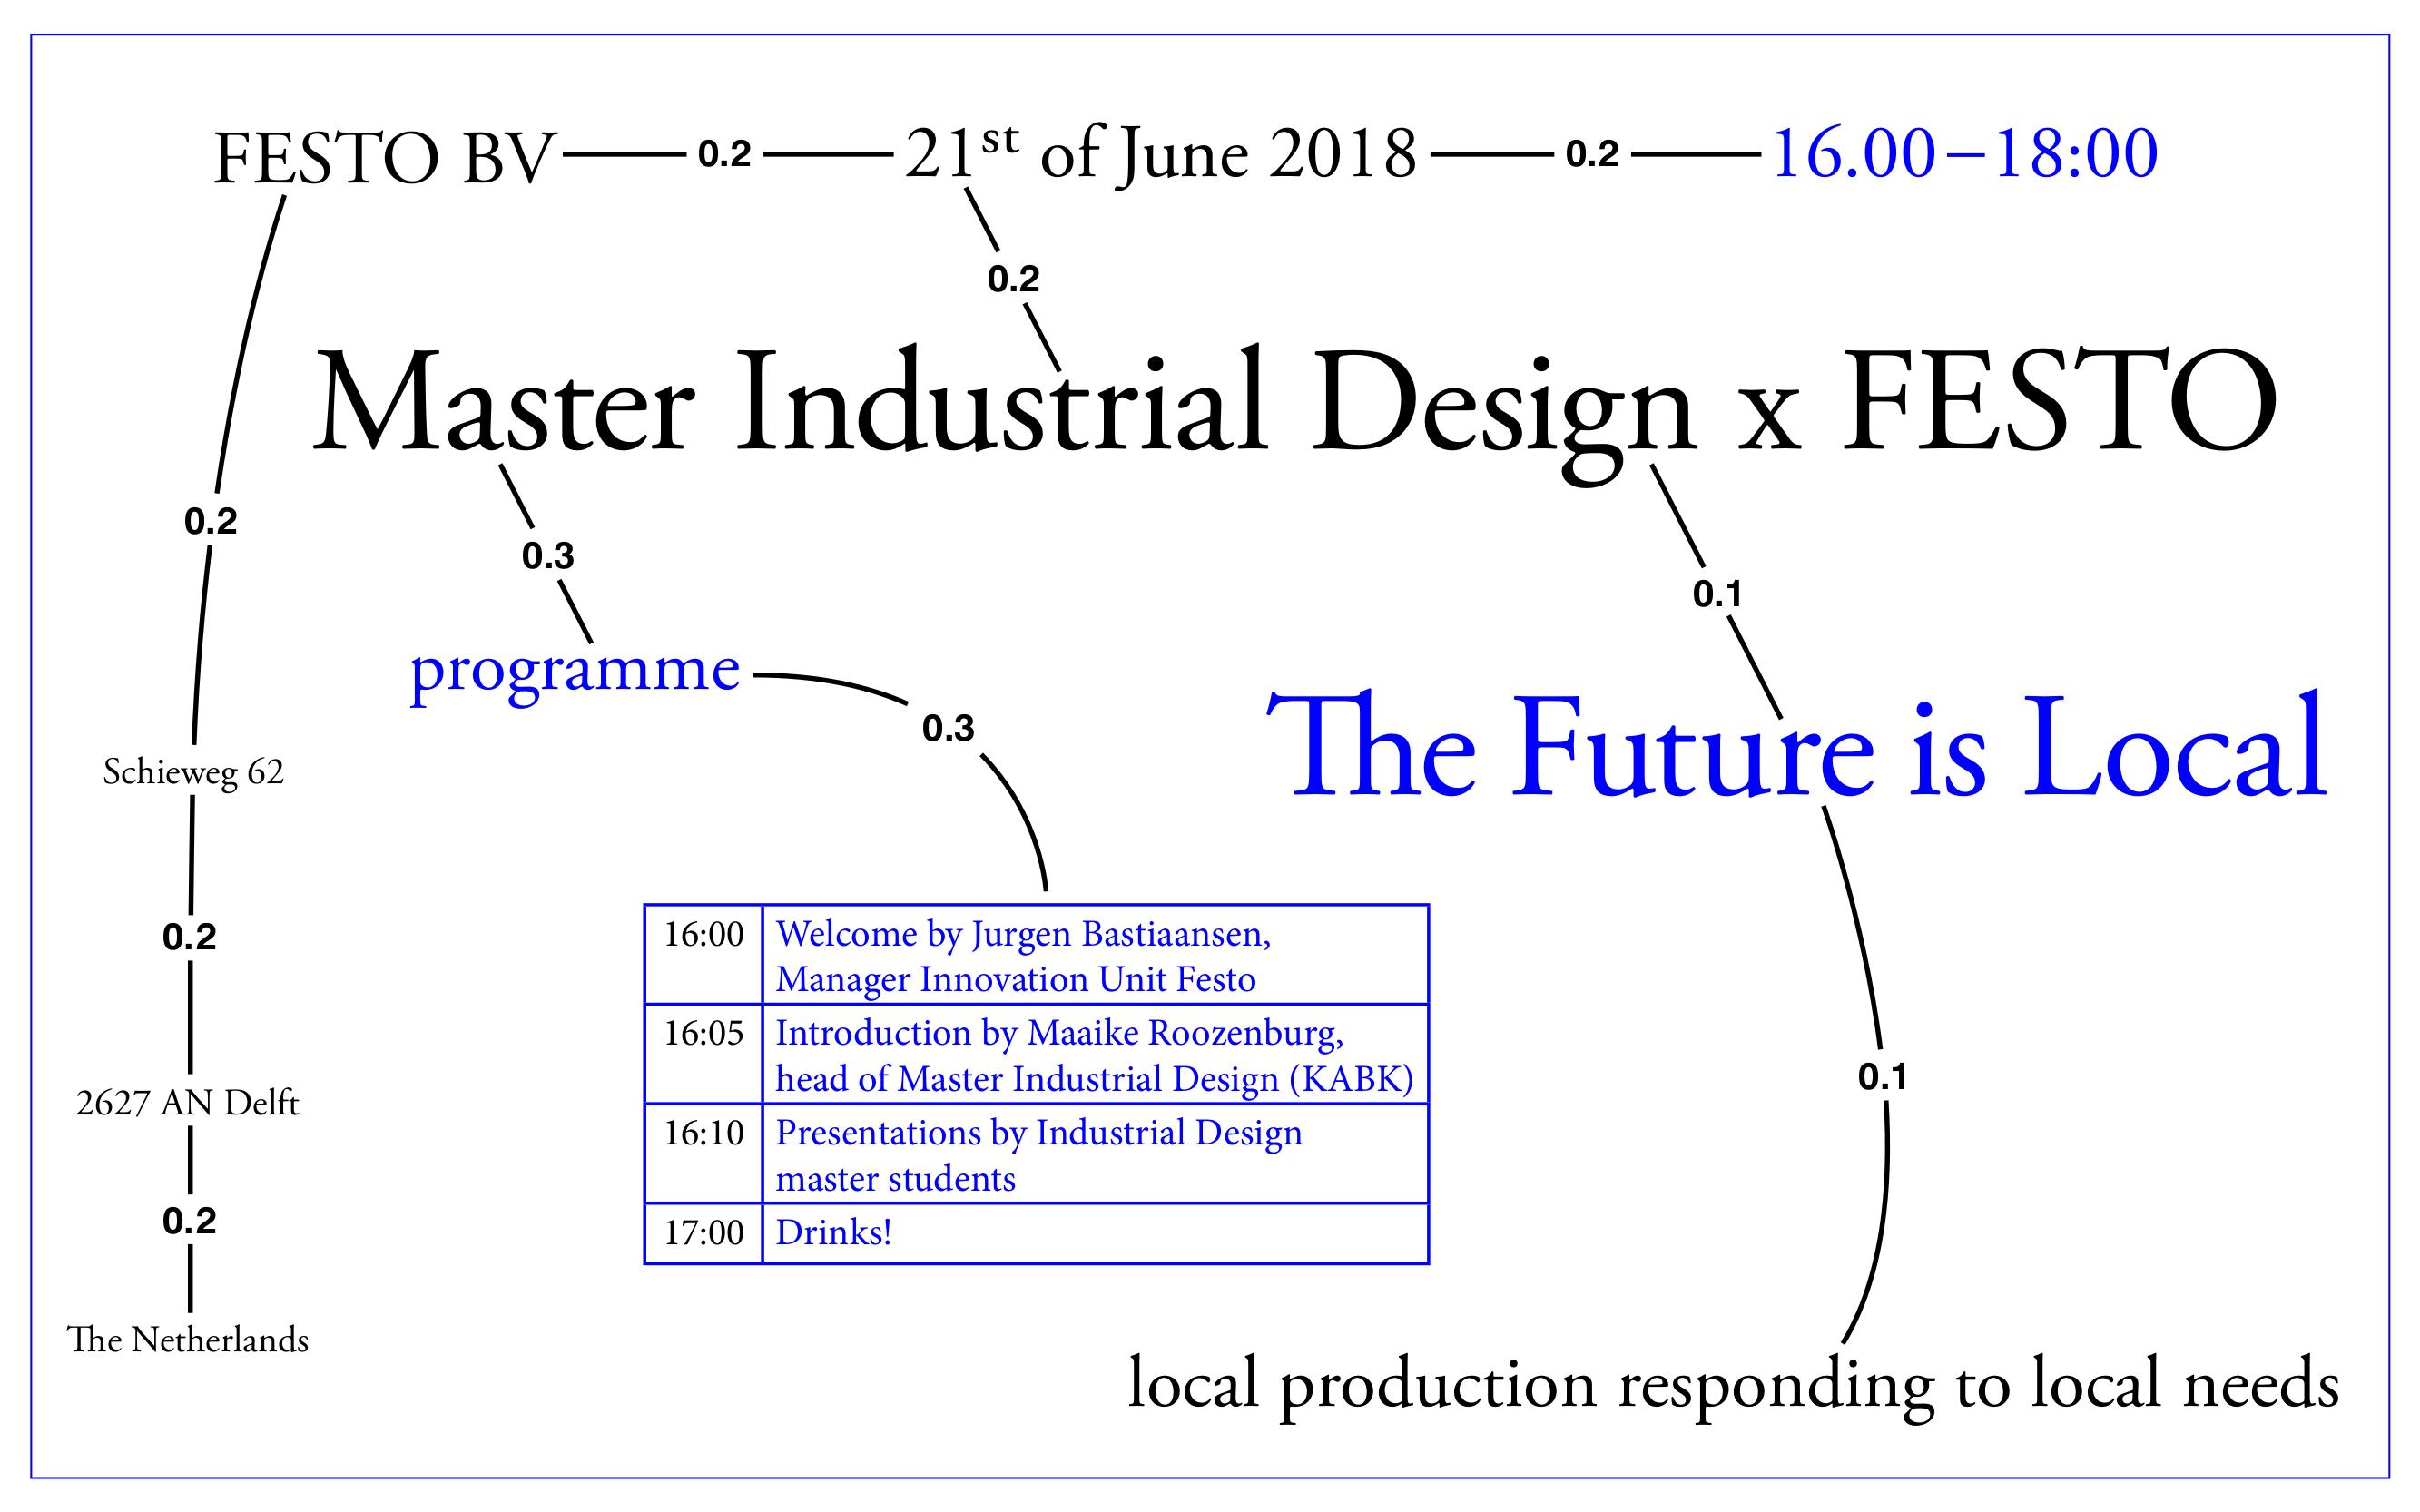 Master Industrial Design x Festo